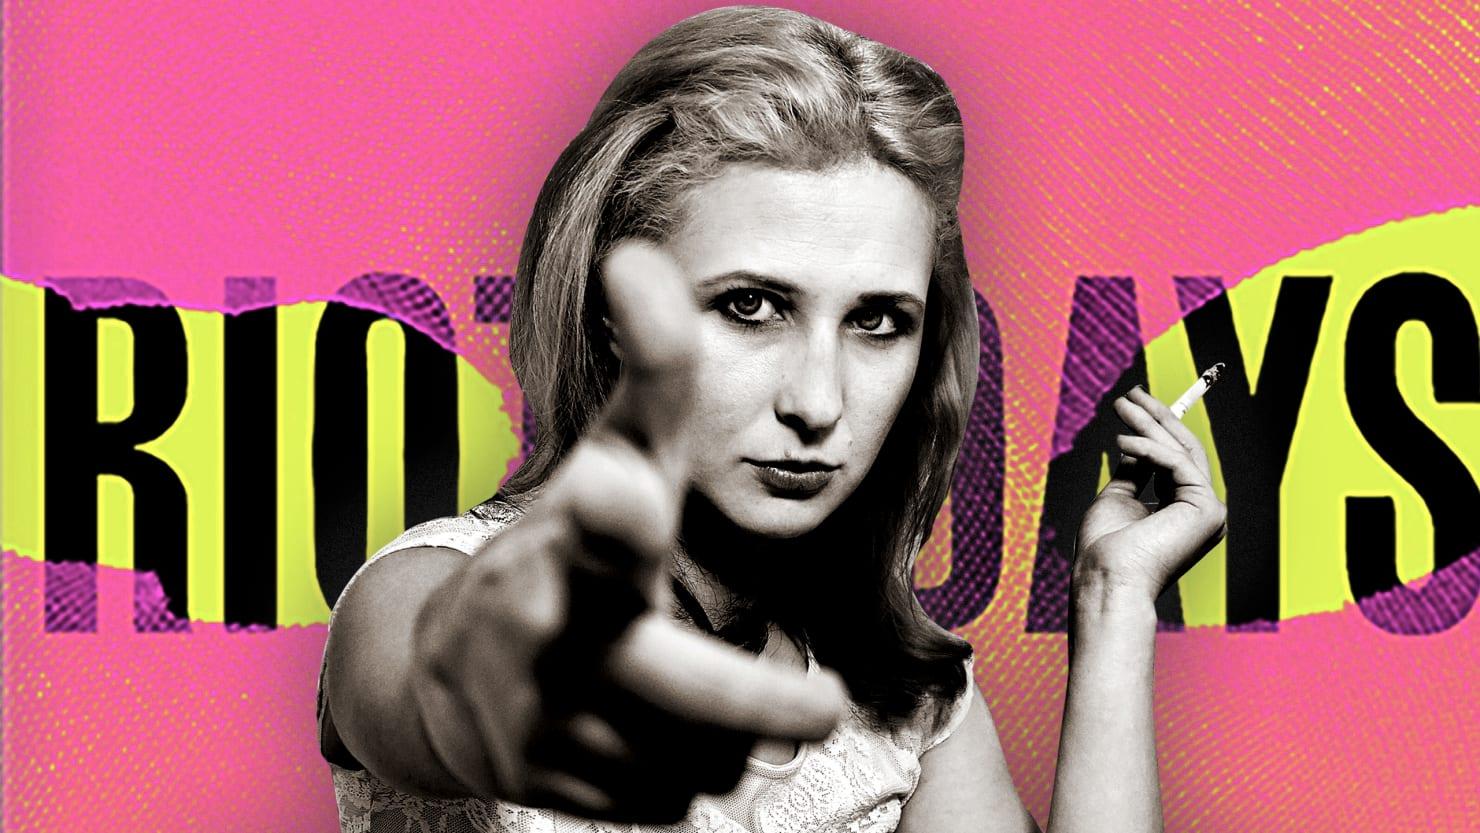 free-ukraine-gay-personals-help